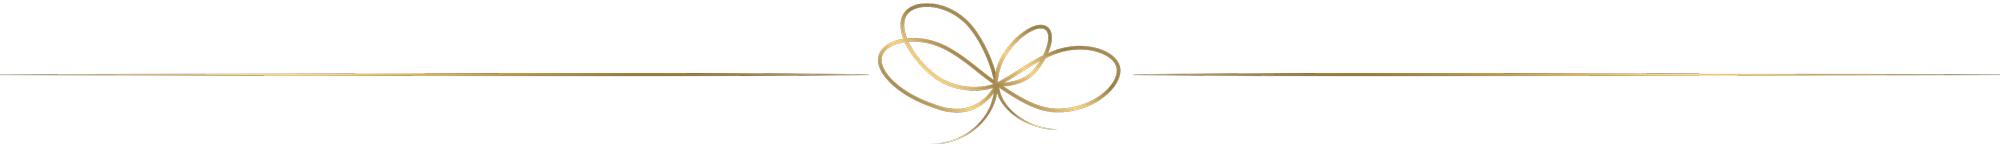 Bow-Line-Divider.png